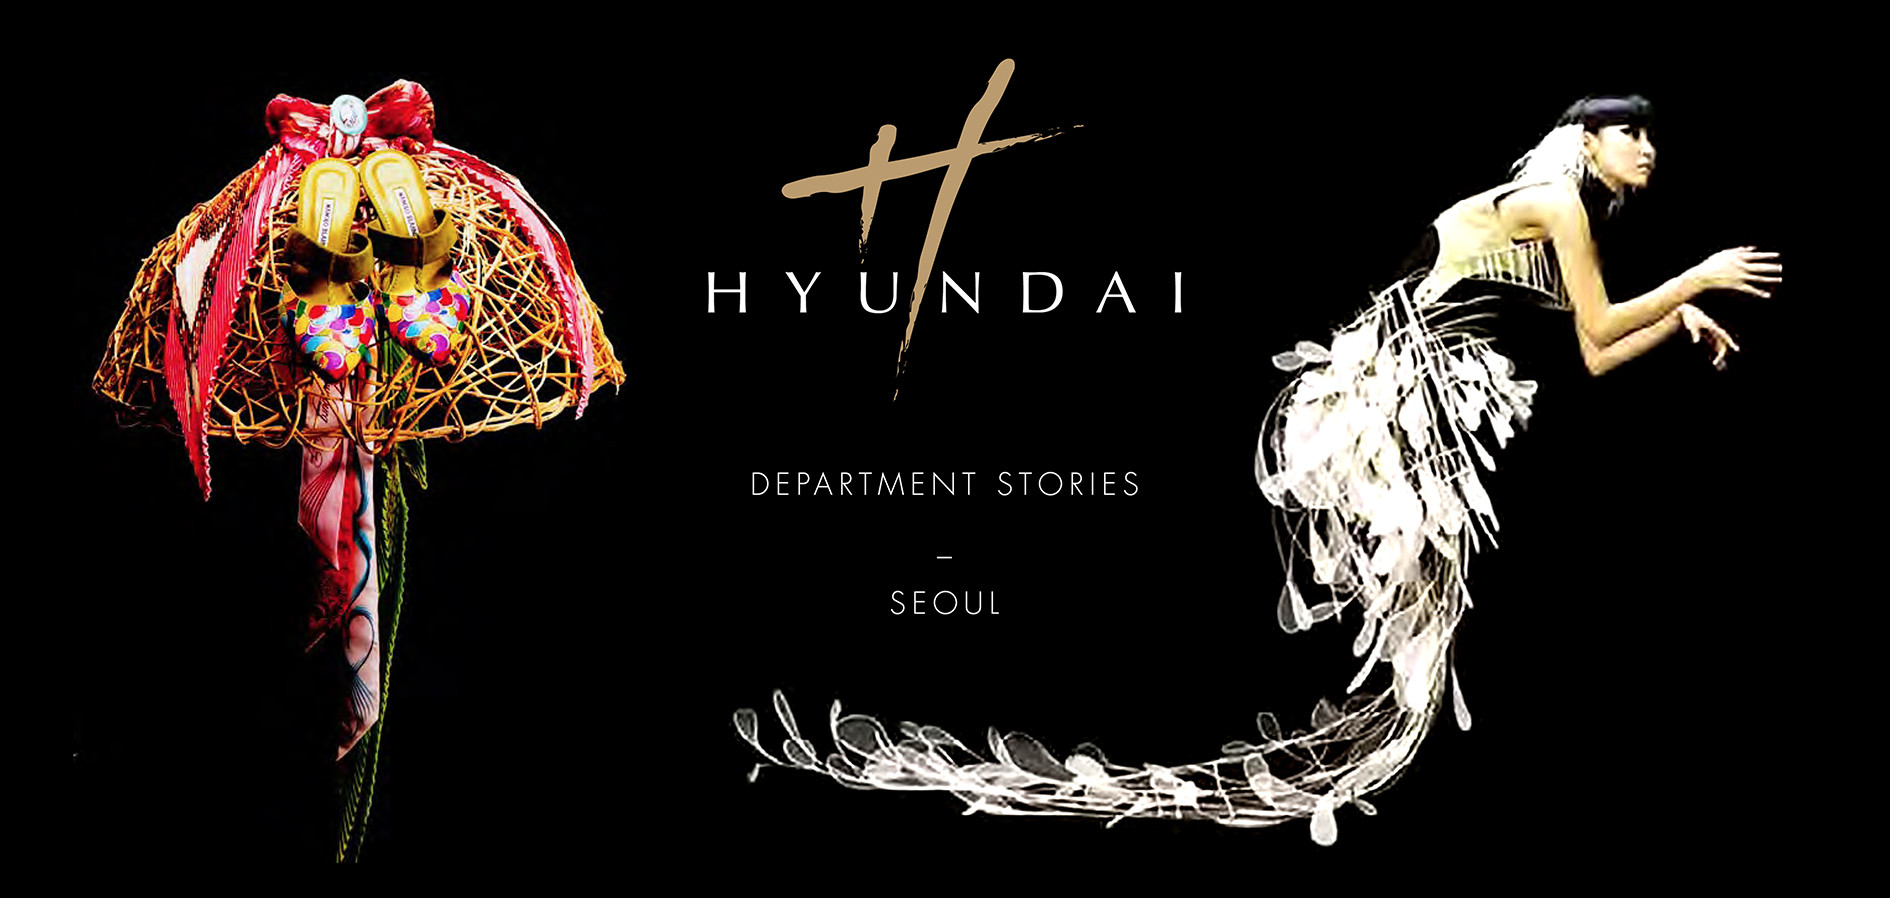 I am Nobilis _ Creative _ Hyundai Depart